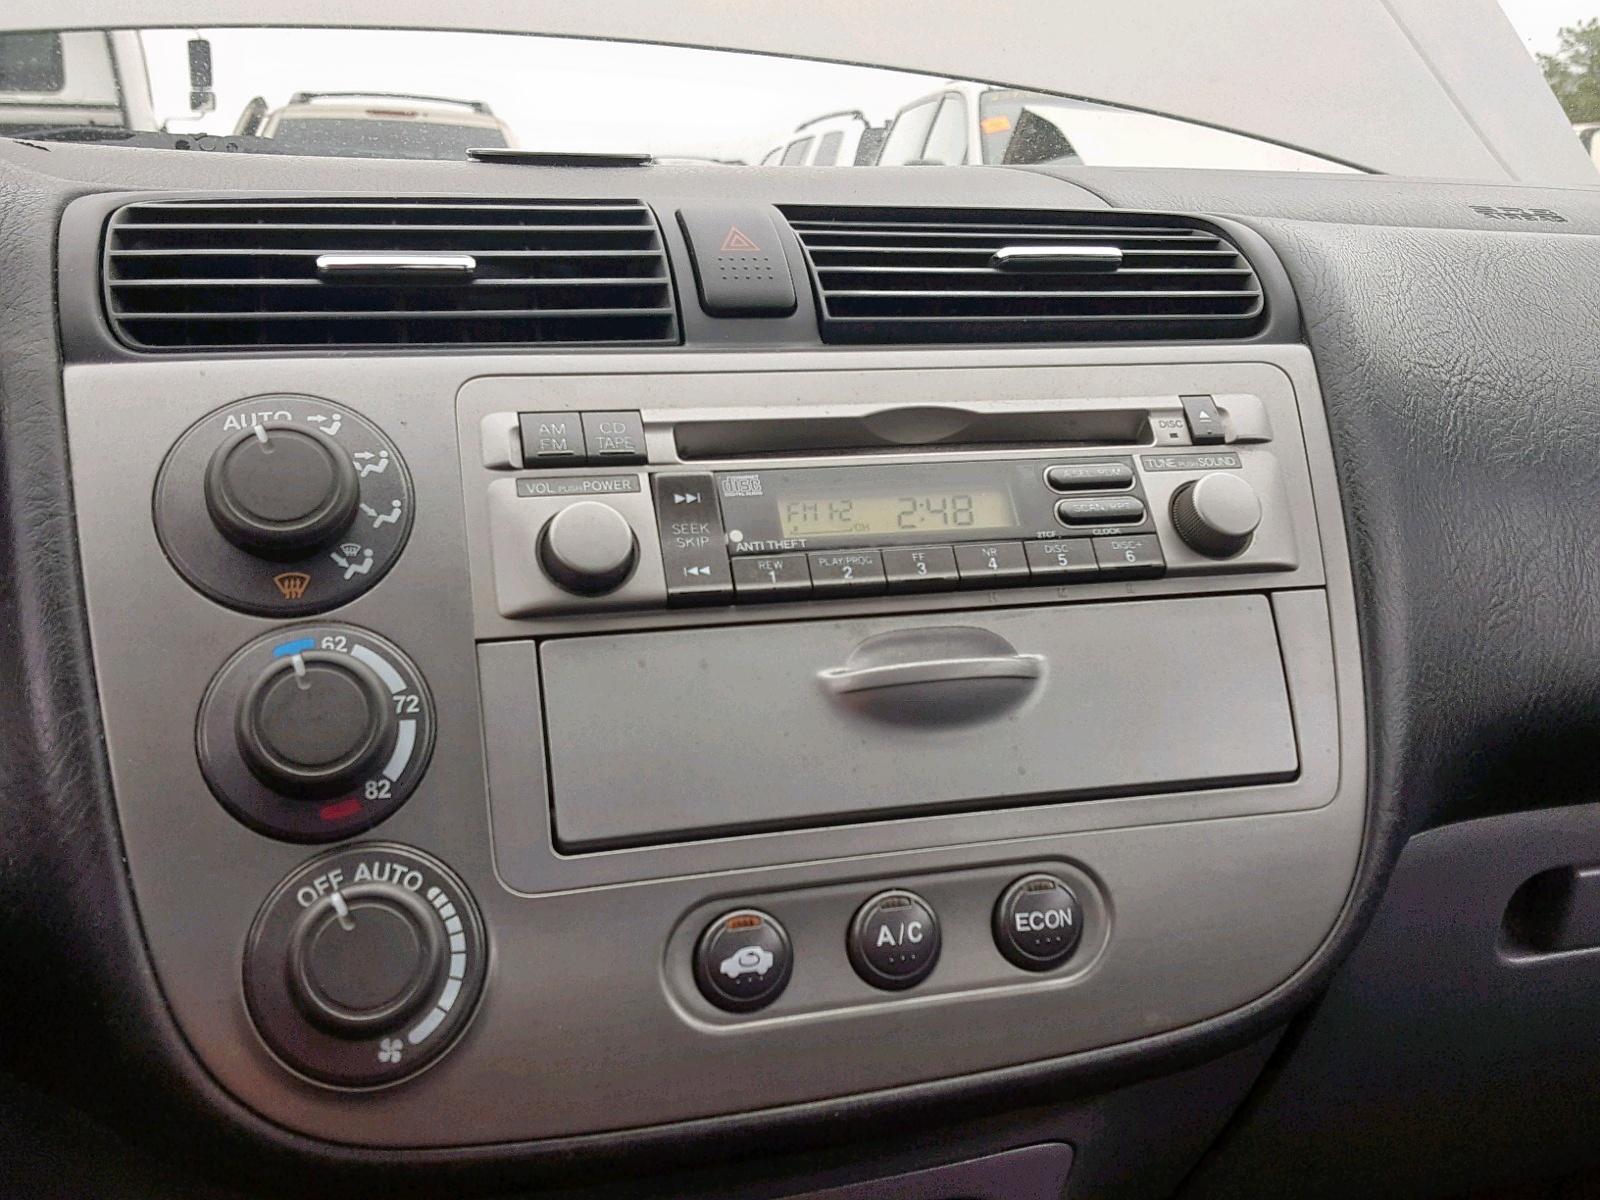 2005 Honda Civic Hybr 1 3L 4 in NY - Long Island (JHMES96635S019863